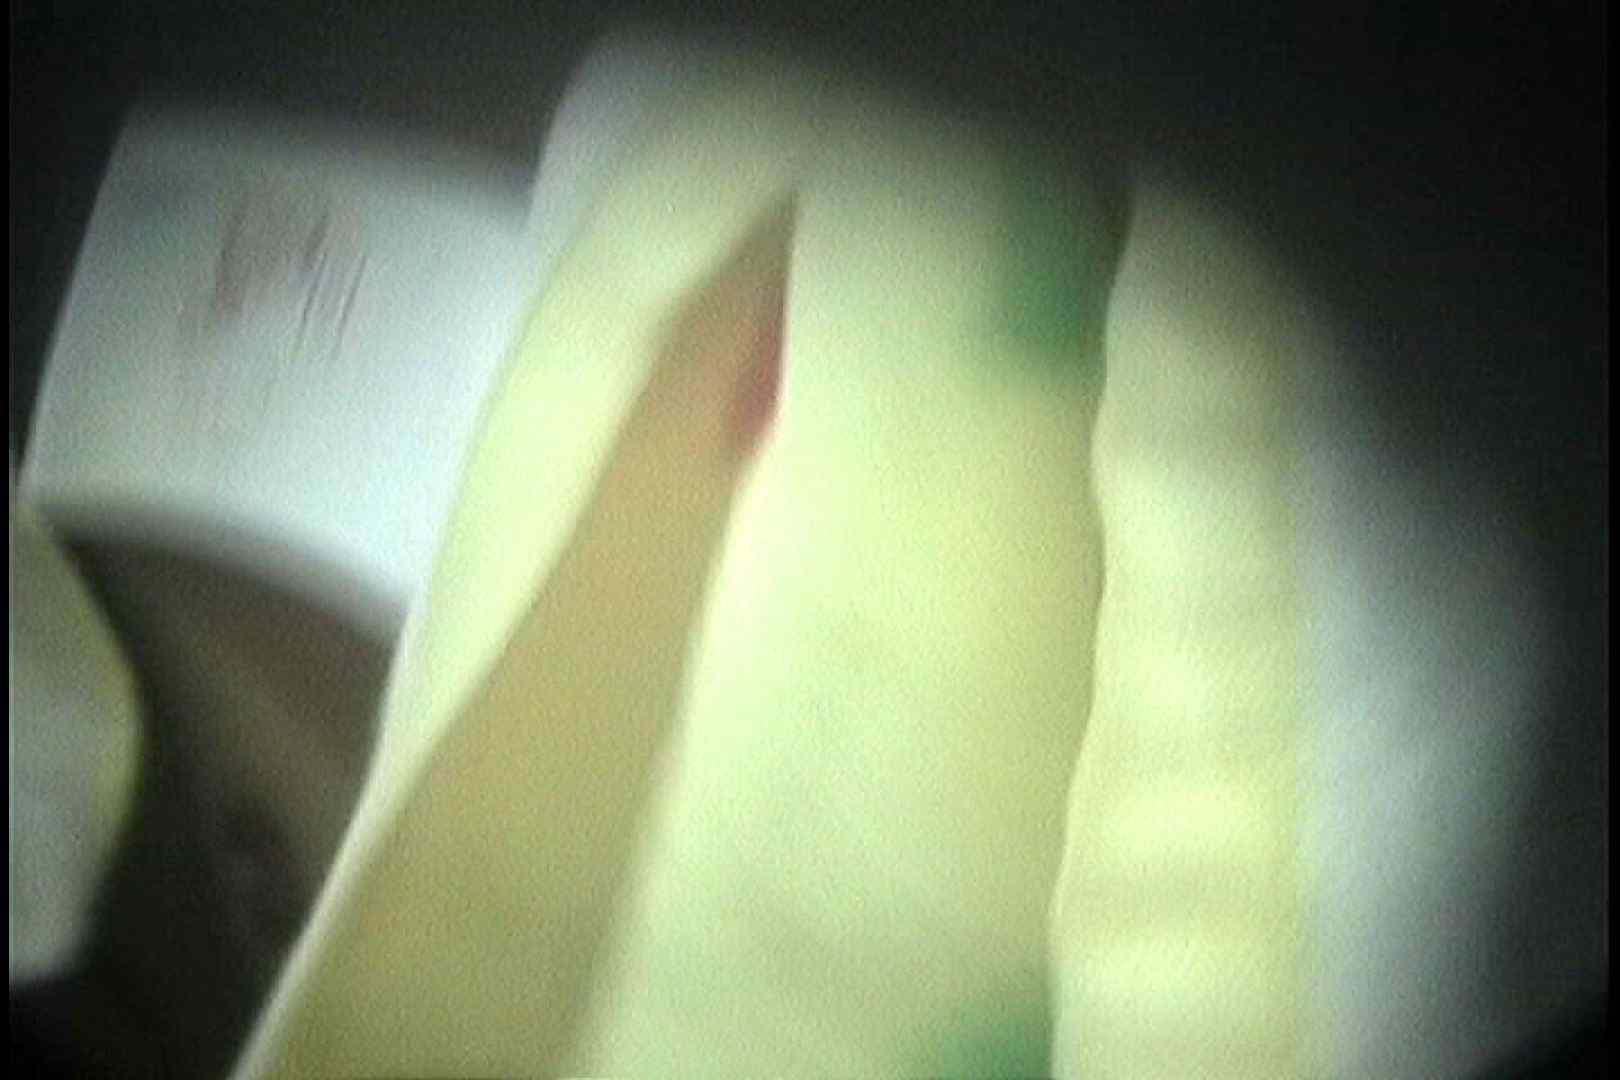 No.22 日焼け跡とオッパイの関係がおかしな貧乳ギャル 乙女  70pic 23